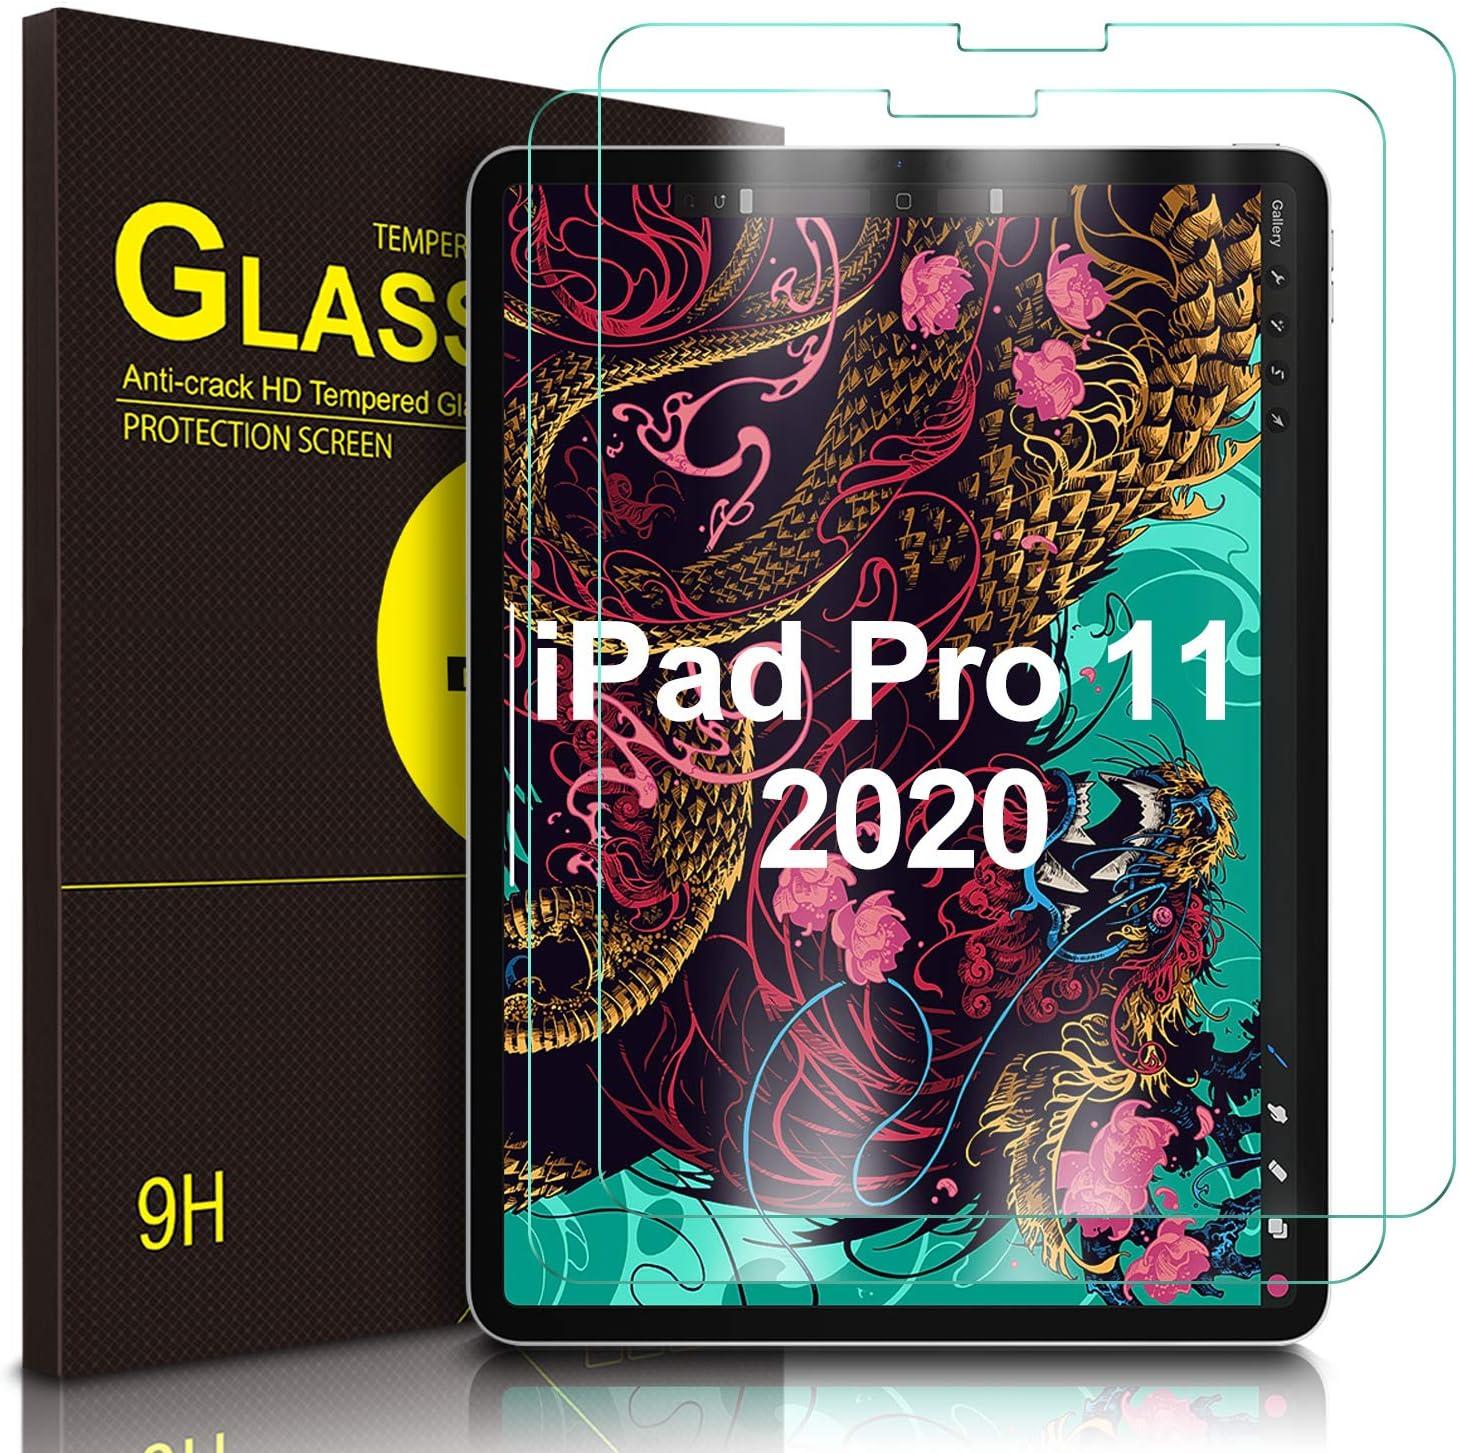 IVSO Templado Protector para iPad Pro 11 2020, Premium Cristal de Pantalla de Vidrio Templado para Apple iPad Pro 11 2020, 2 Pack